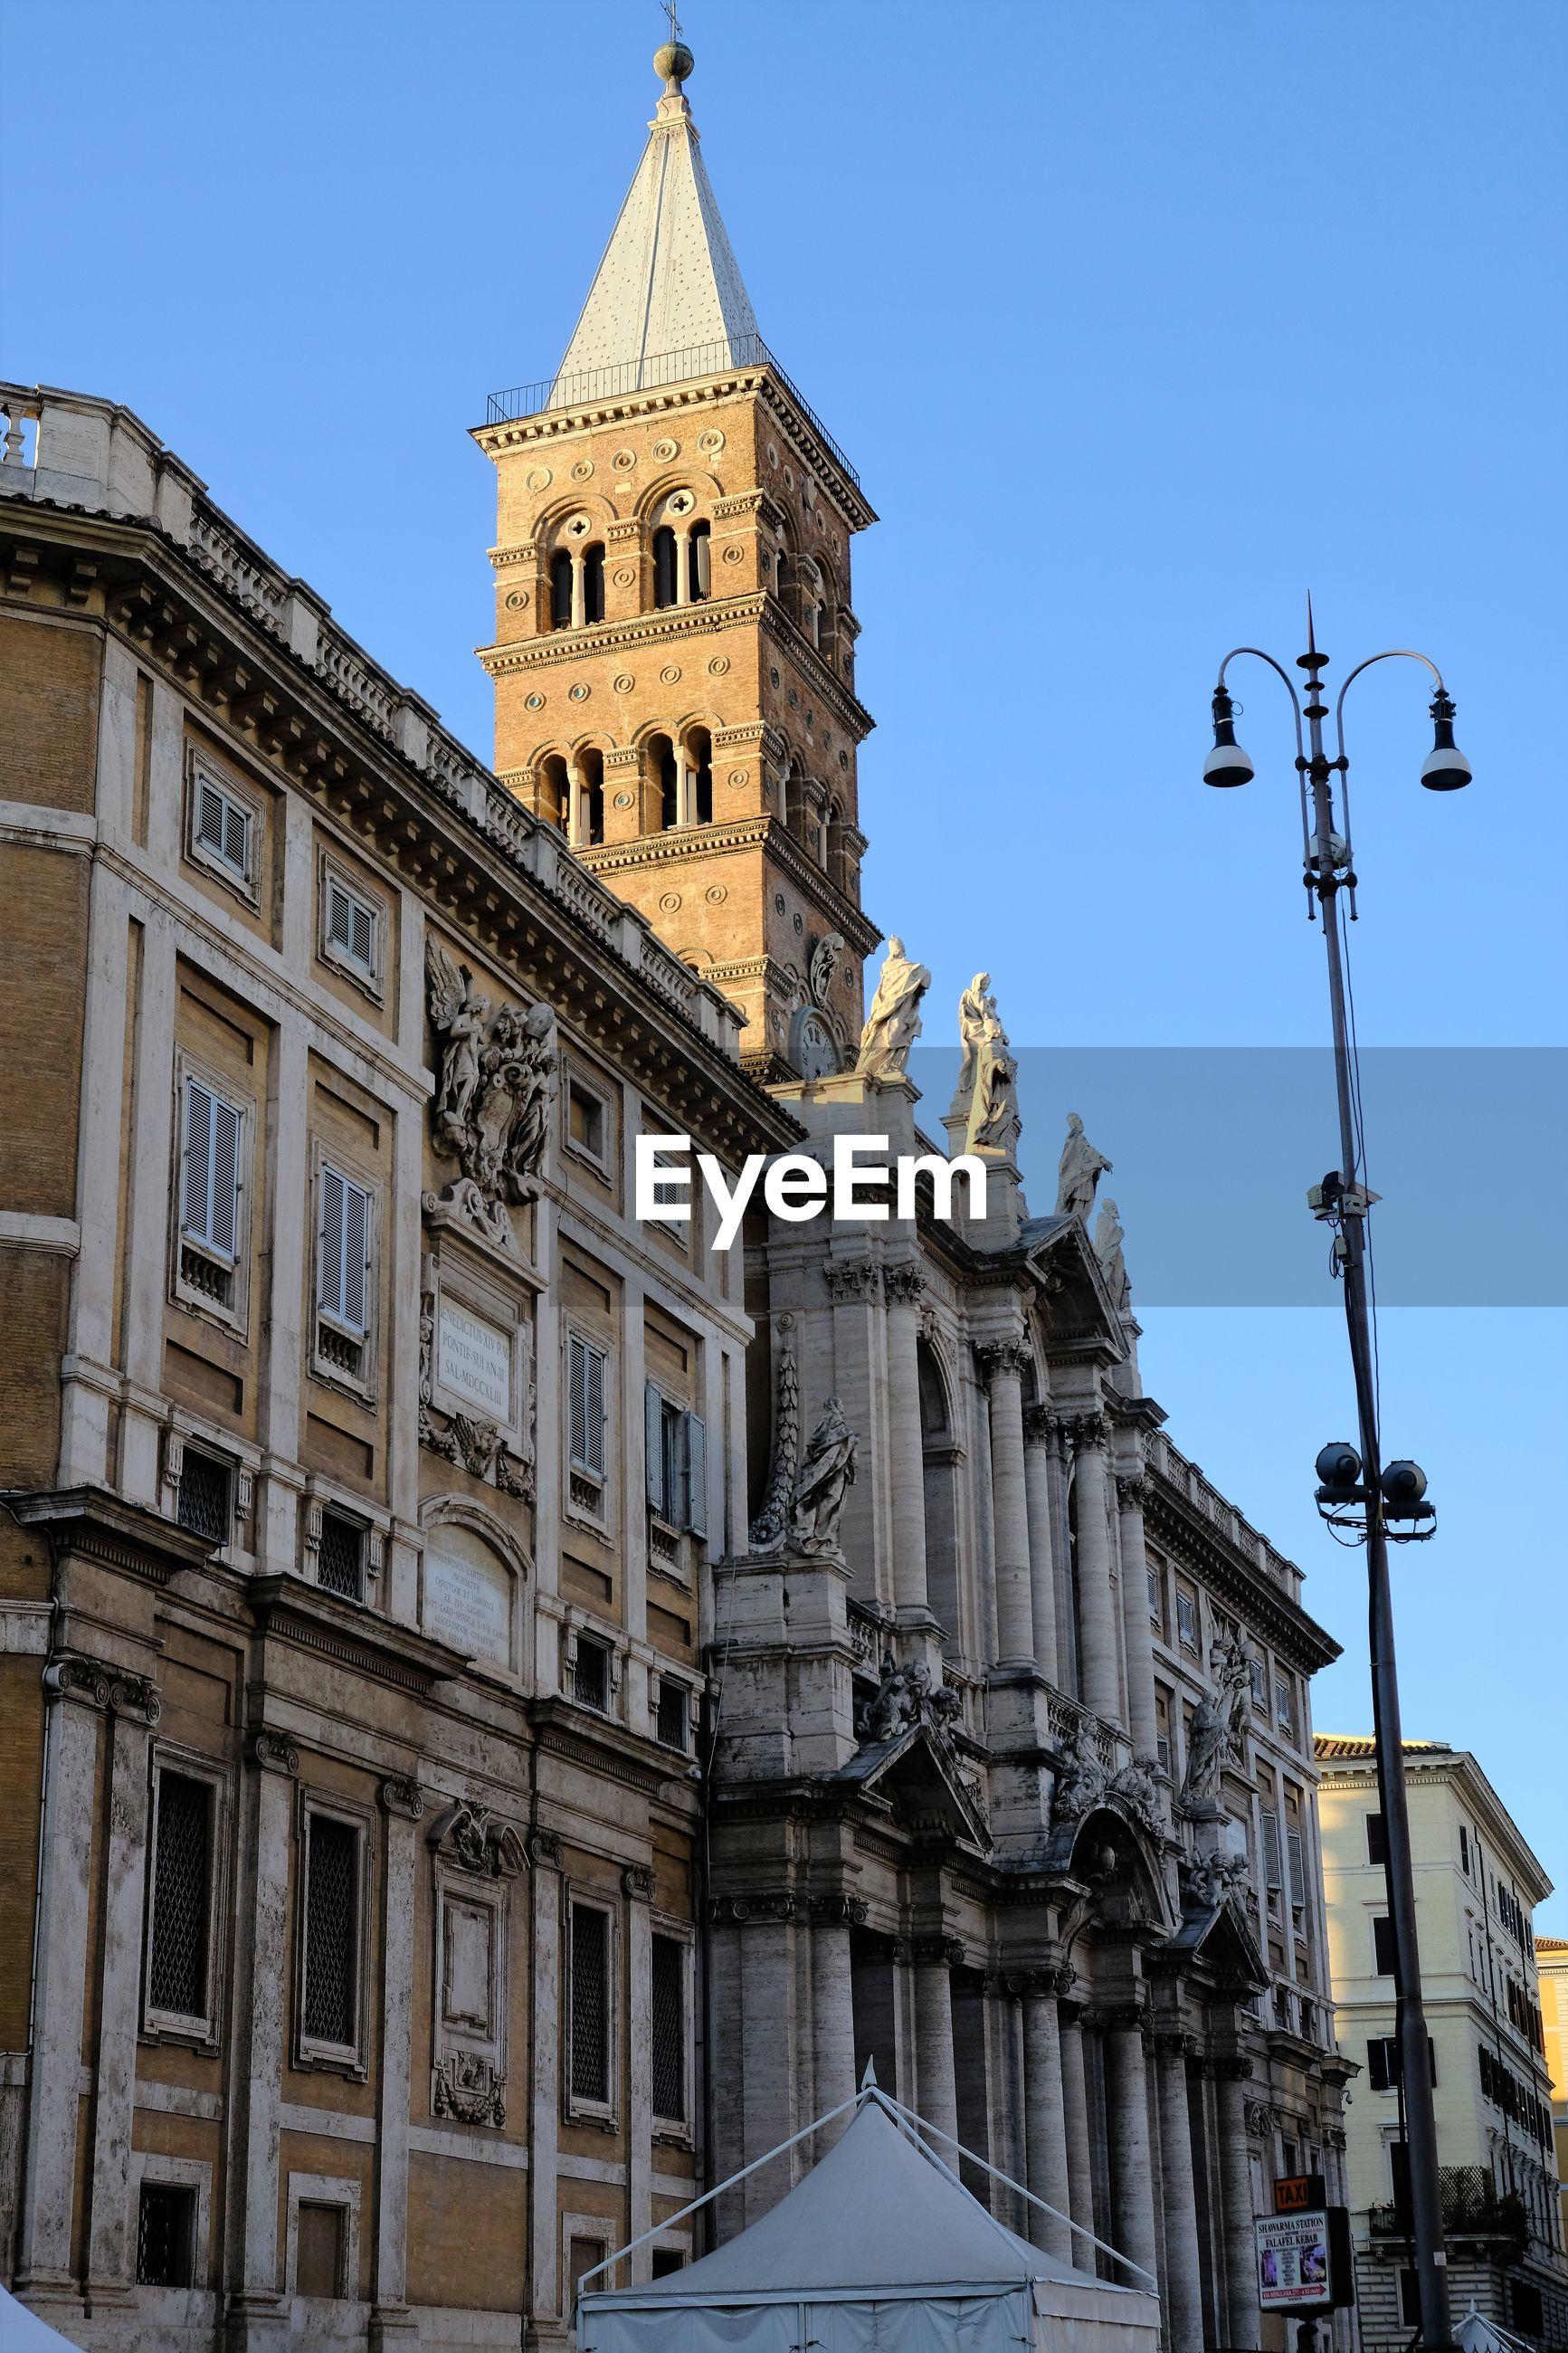 Basilica di santa maria maggiore, papal major basilica and the largest catholic marian church